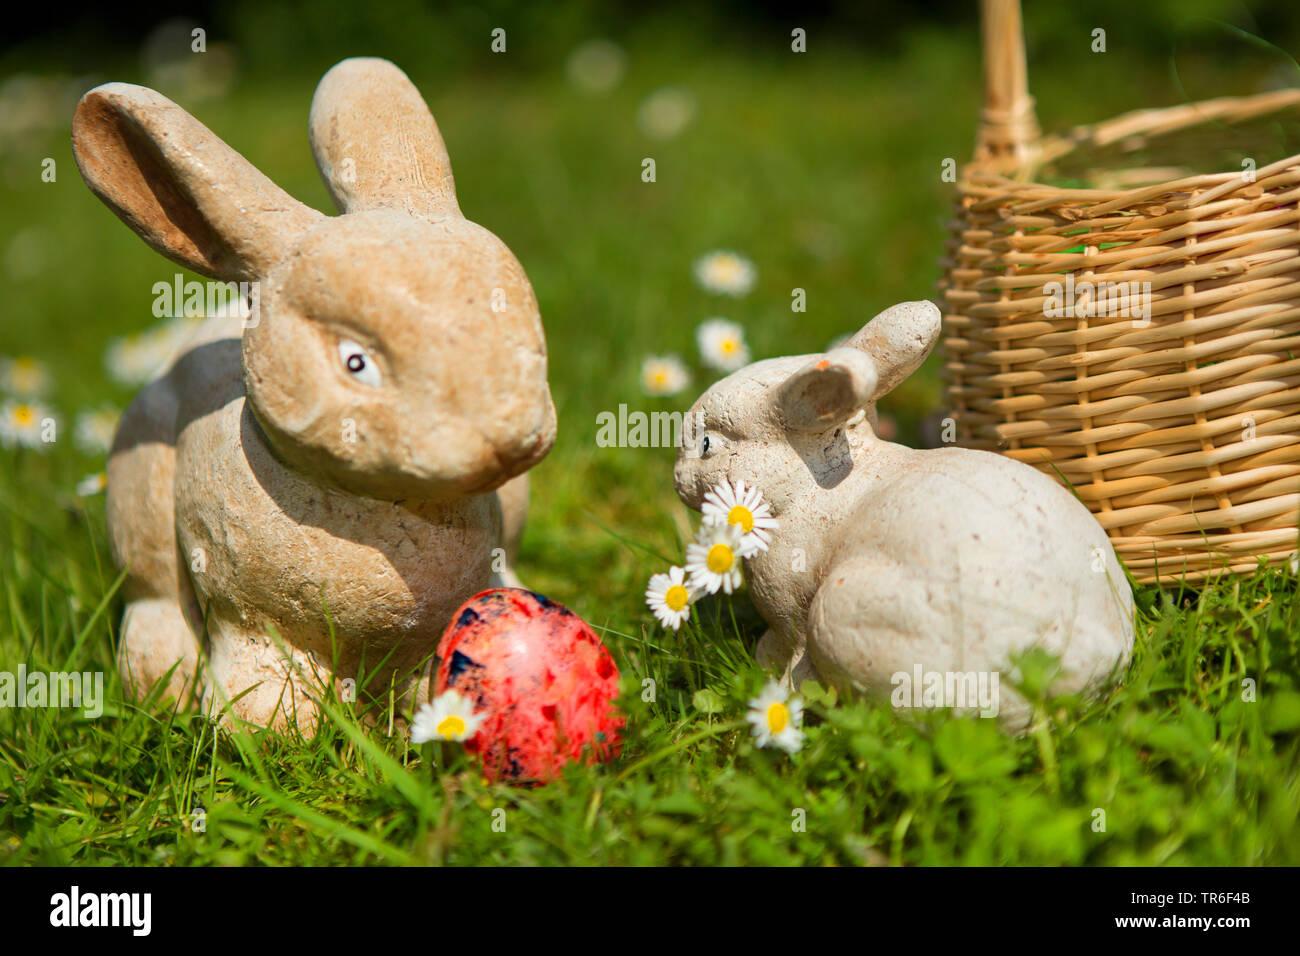 Deko-Osterhasen mit Ostereiauf dem Rasen, Deutschland | Easter bunnies and Easter egg on lawn, Germany | BLWS482610.jpg [ (c) blickwinkel/R. Schoenenb - Stock Image